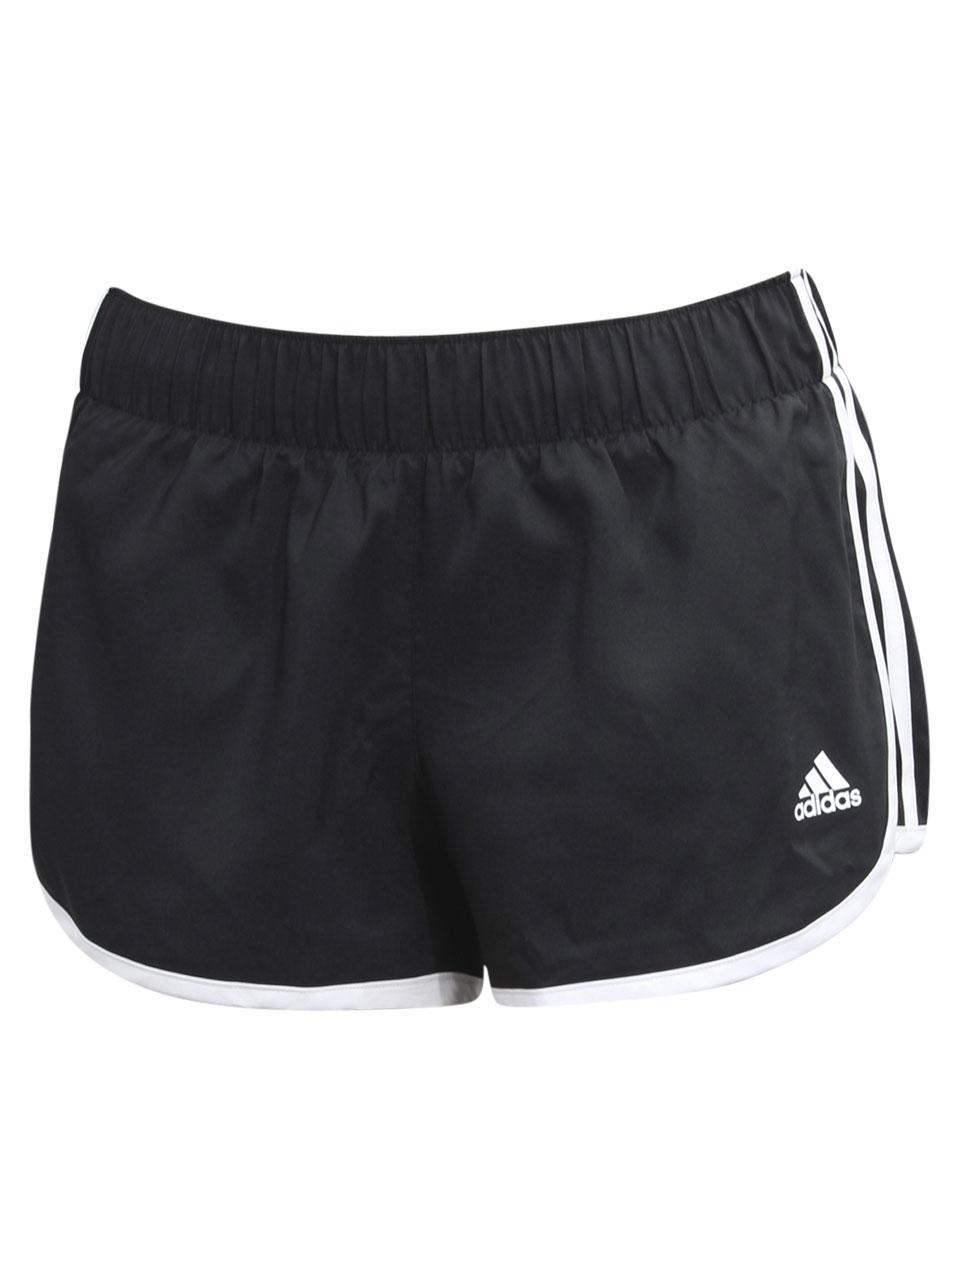 Adidas Women's M10 Woven Slim Fit Climalite Shorts